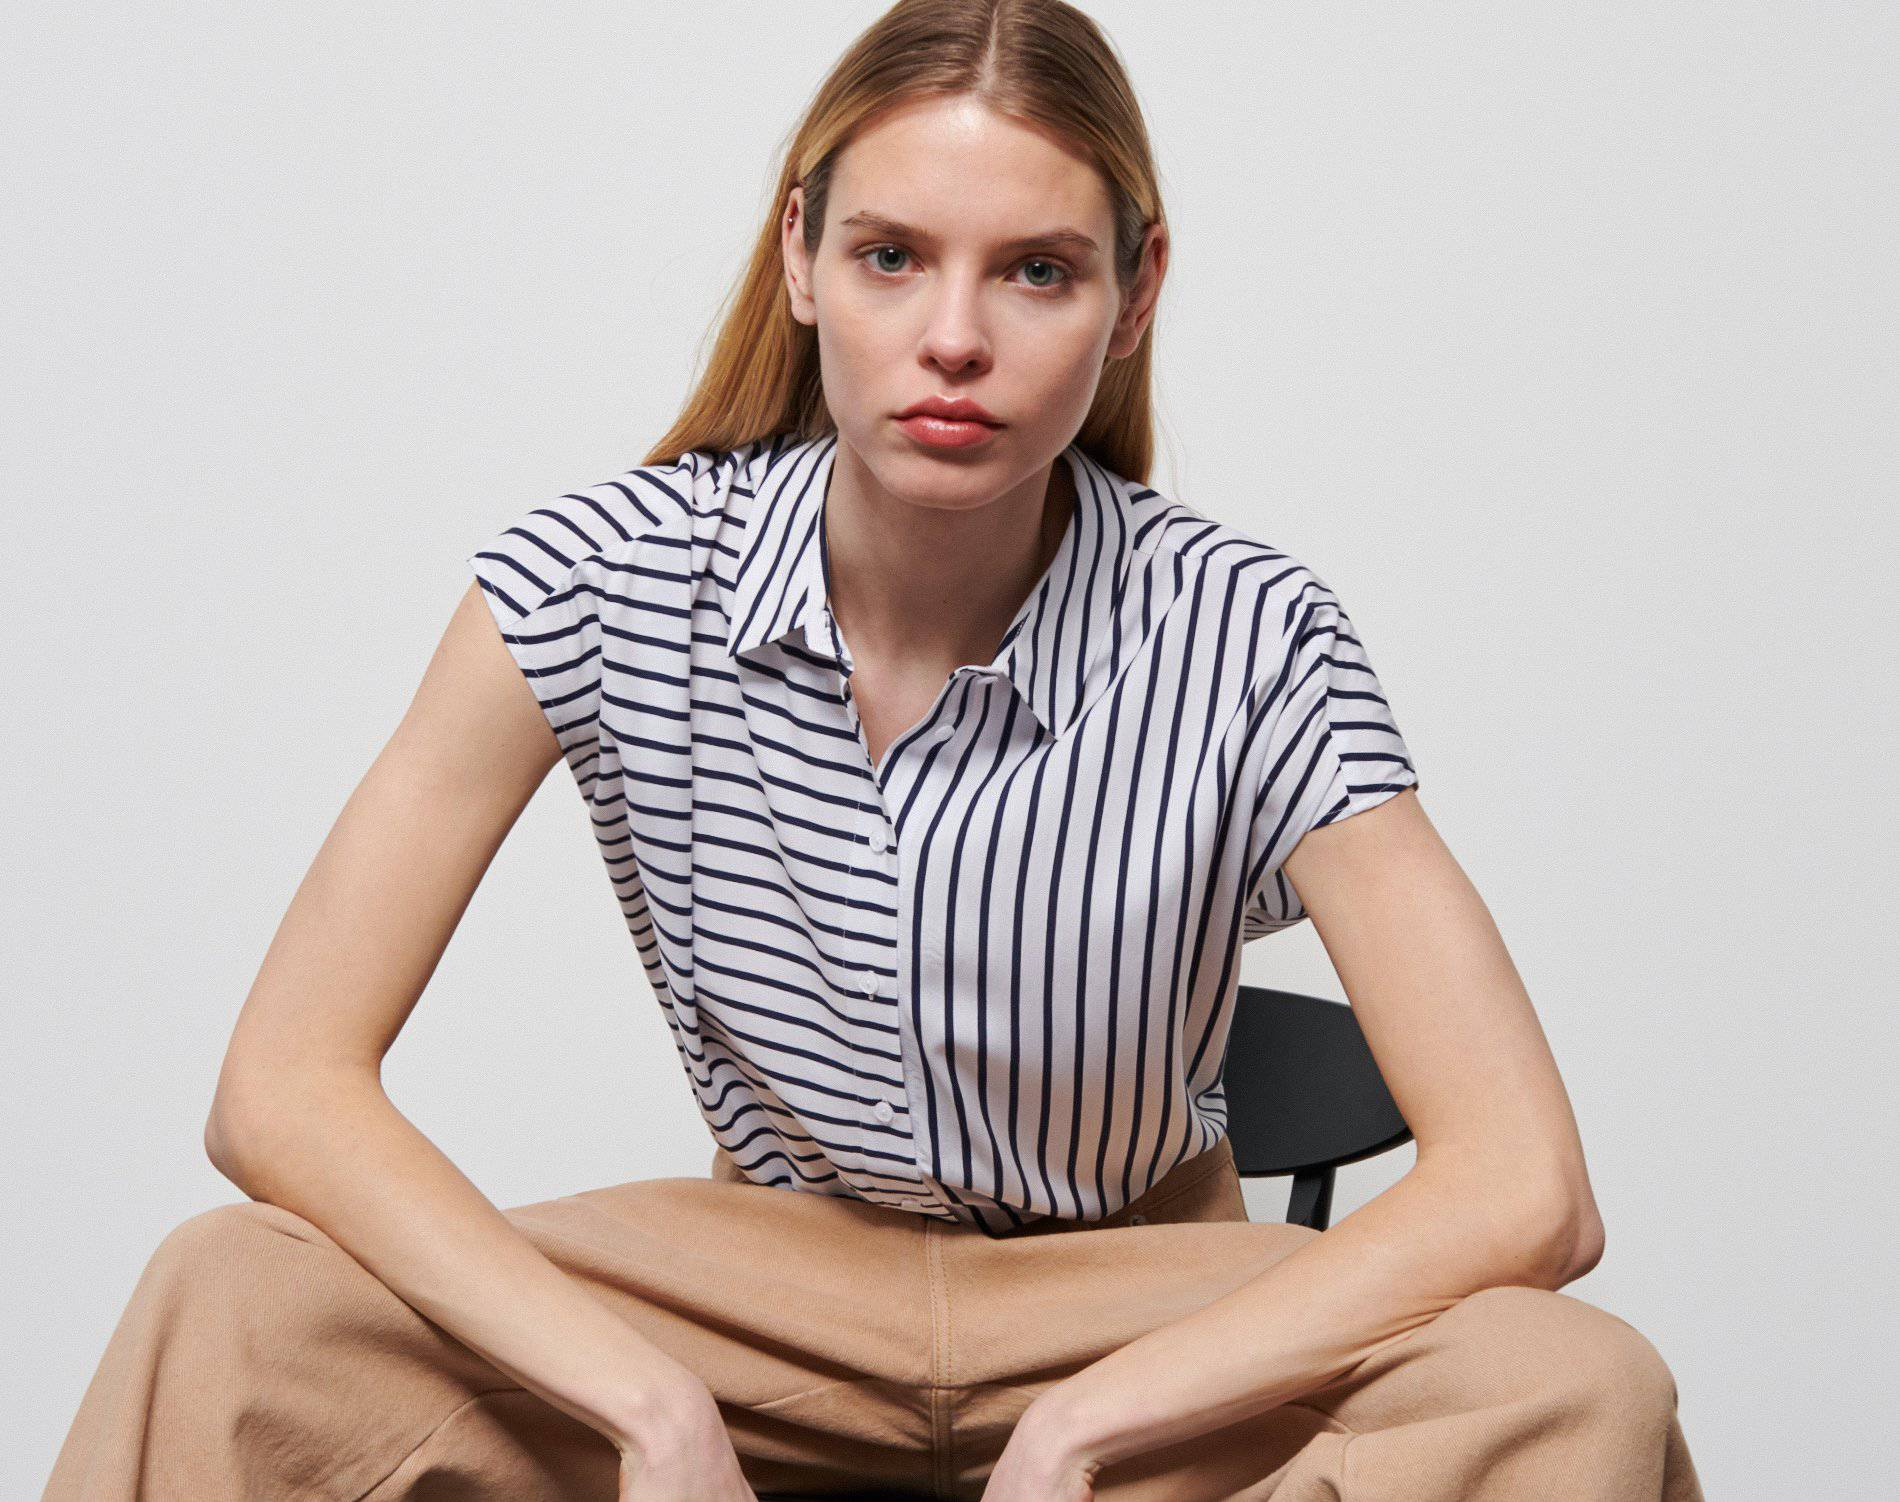 Košulje za ured: Top 10 krojeva za kreativan i chic poslovni stil